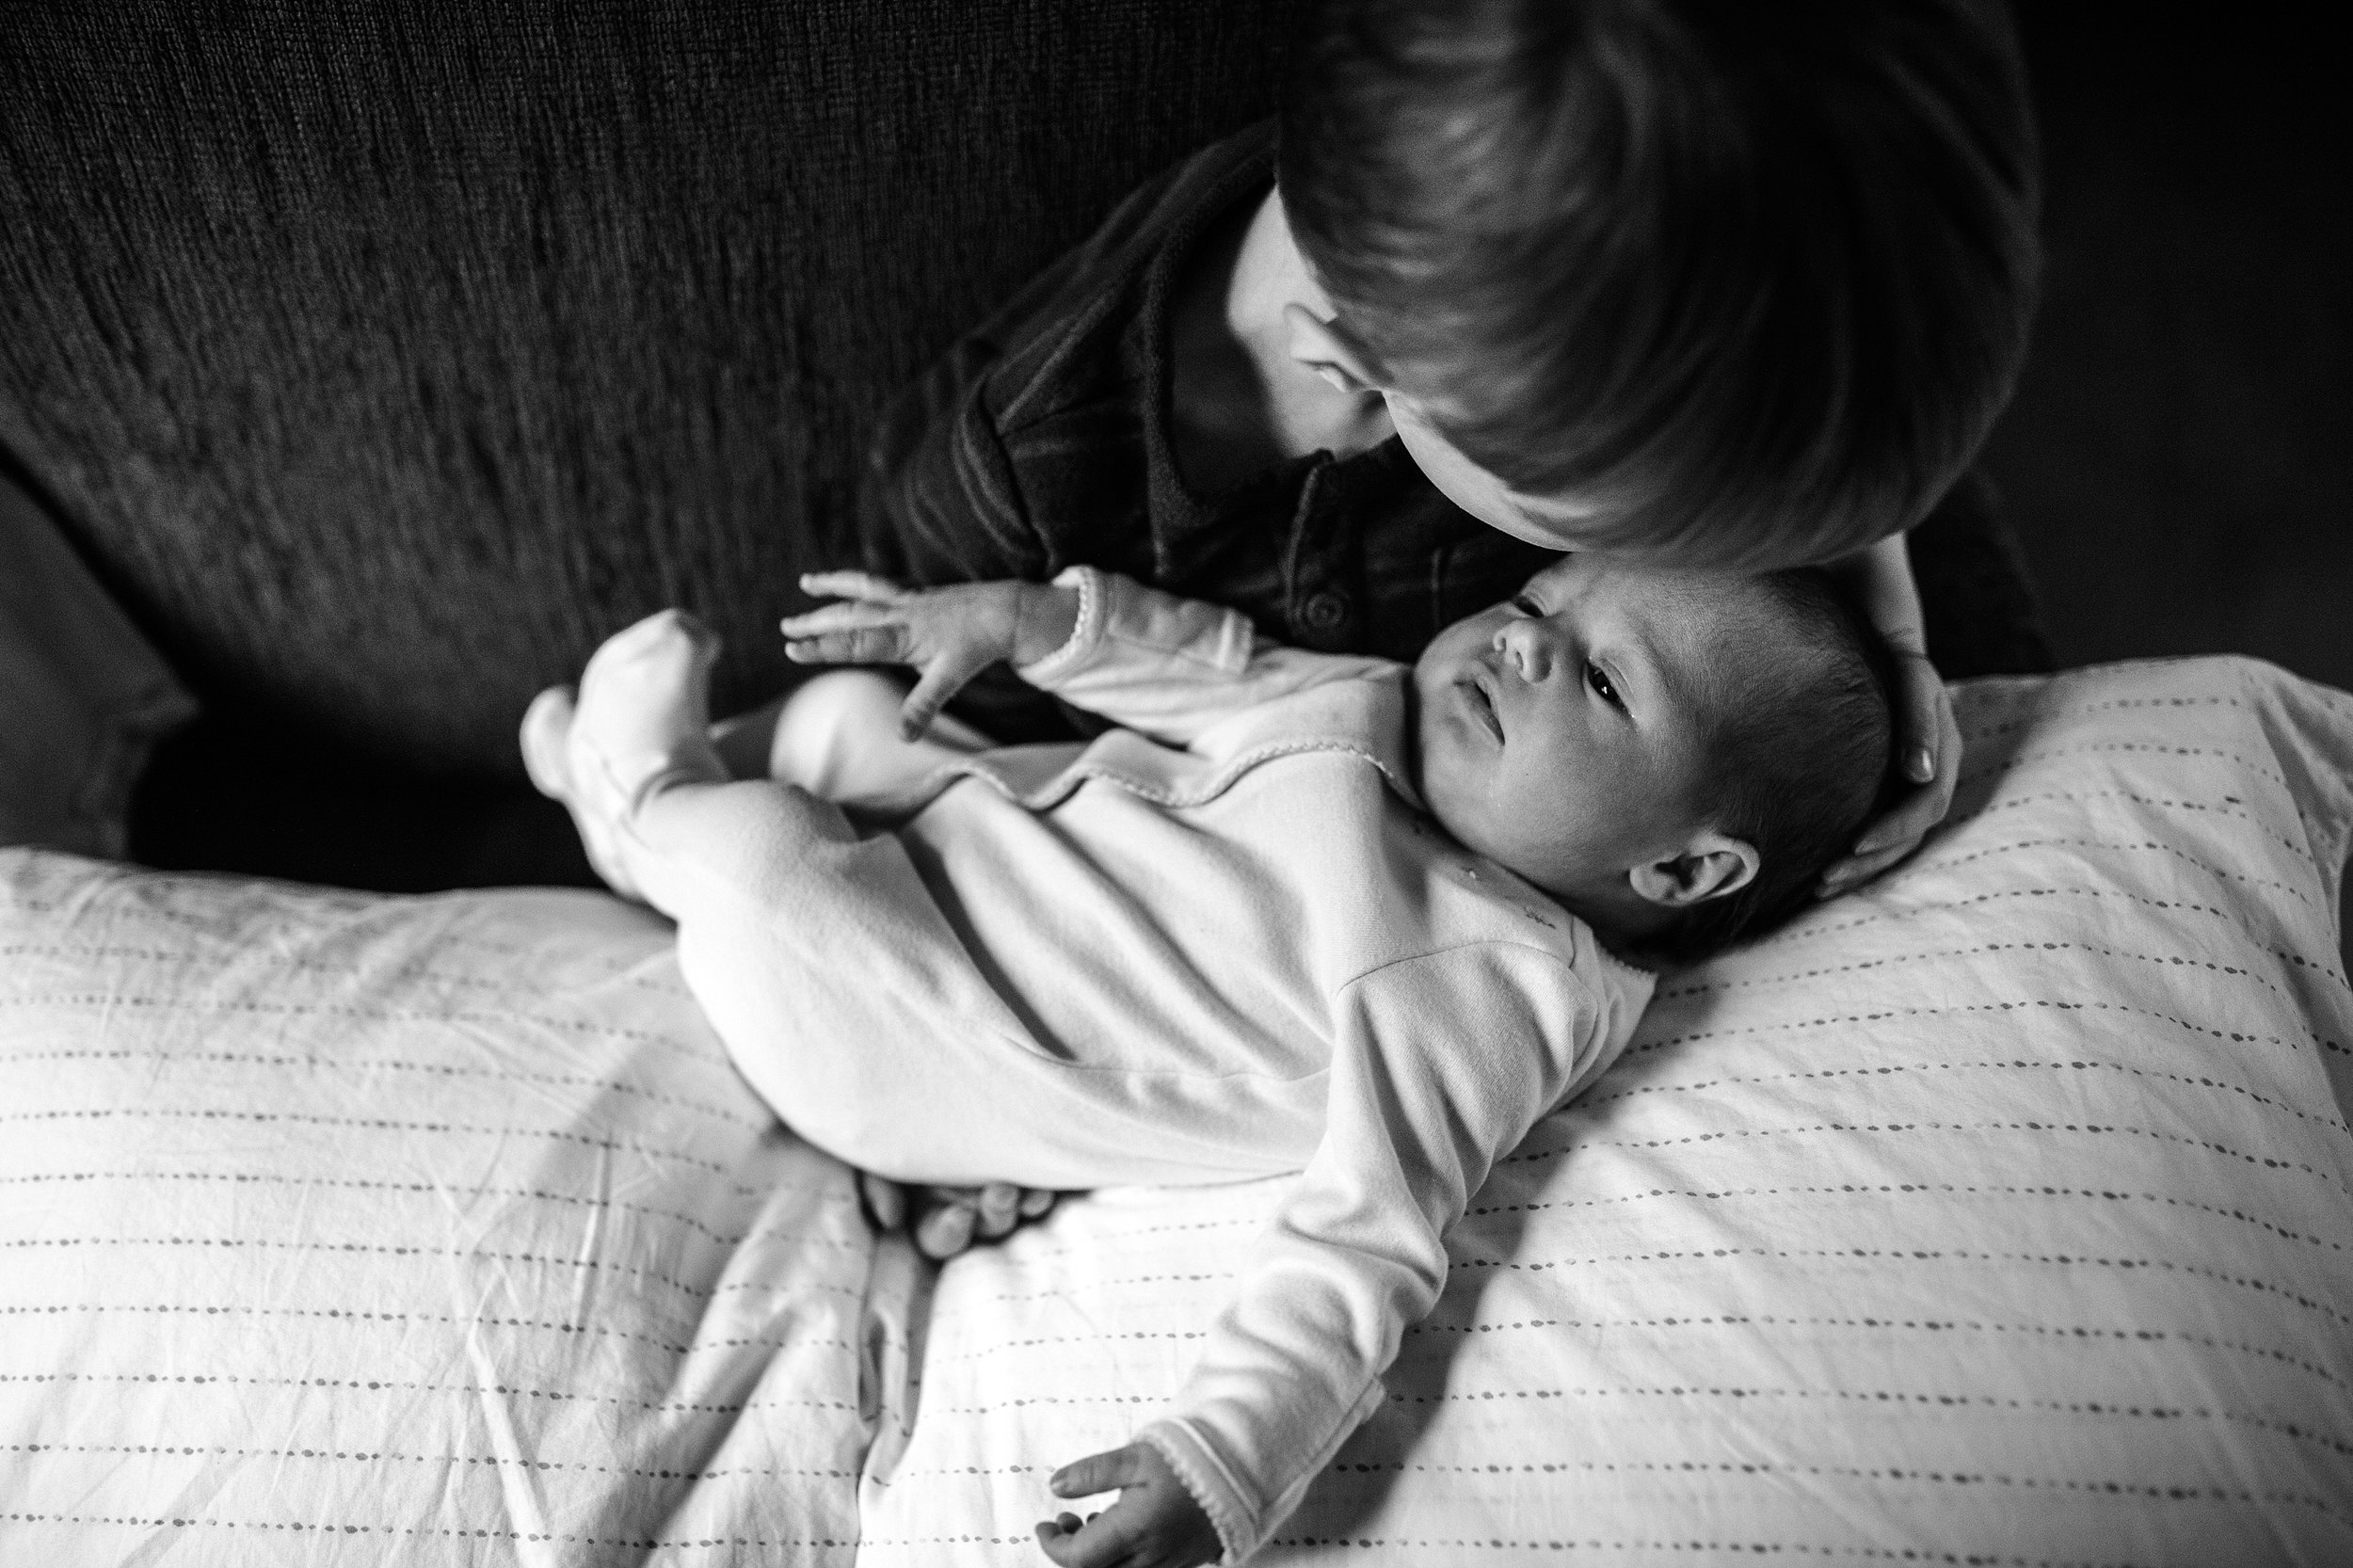 Lehigh-Valley-Newborn-Documentary-Photographer_0051.jpg